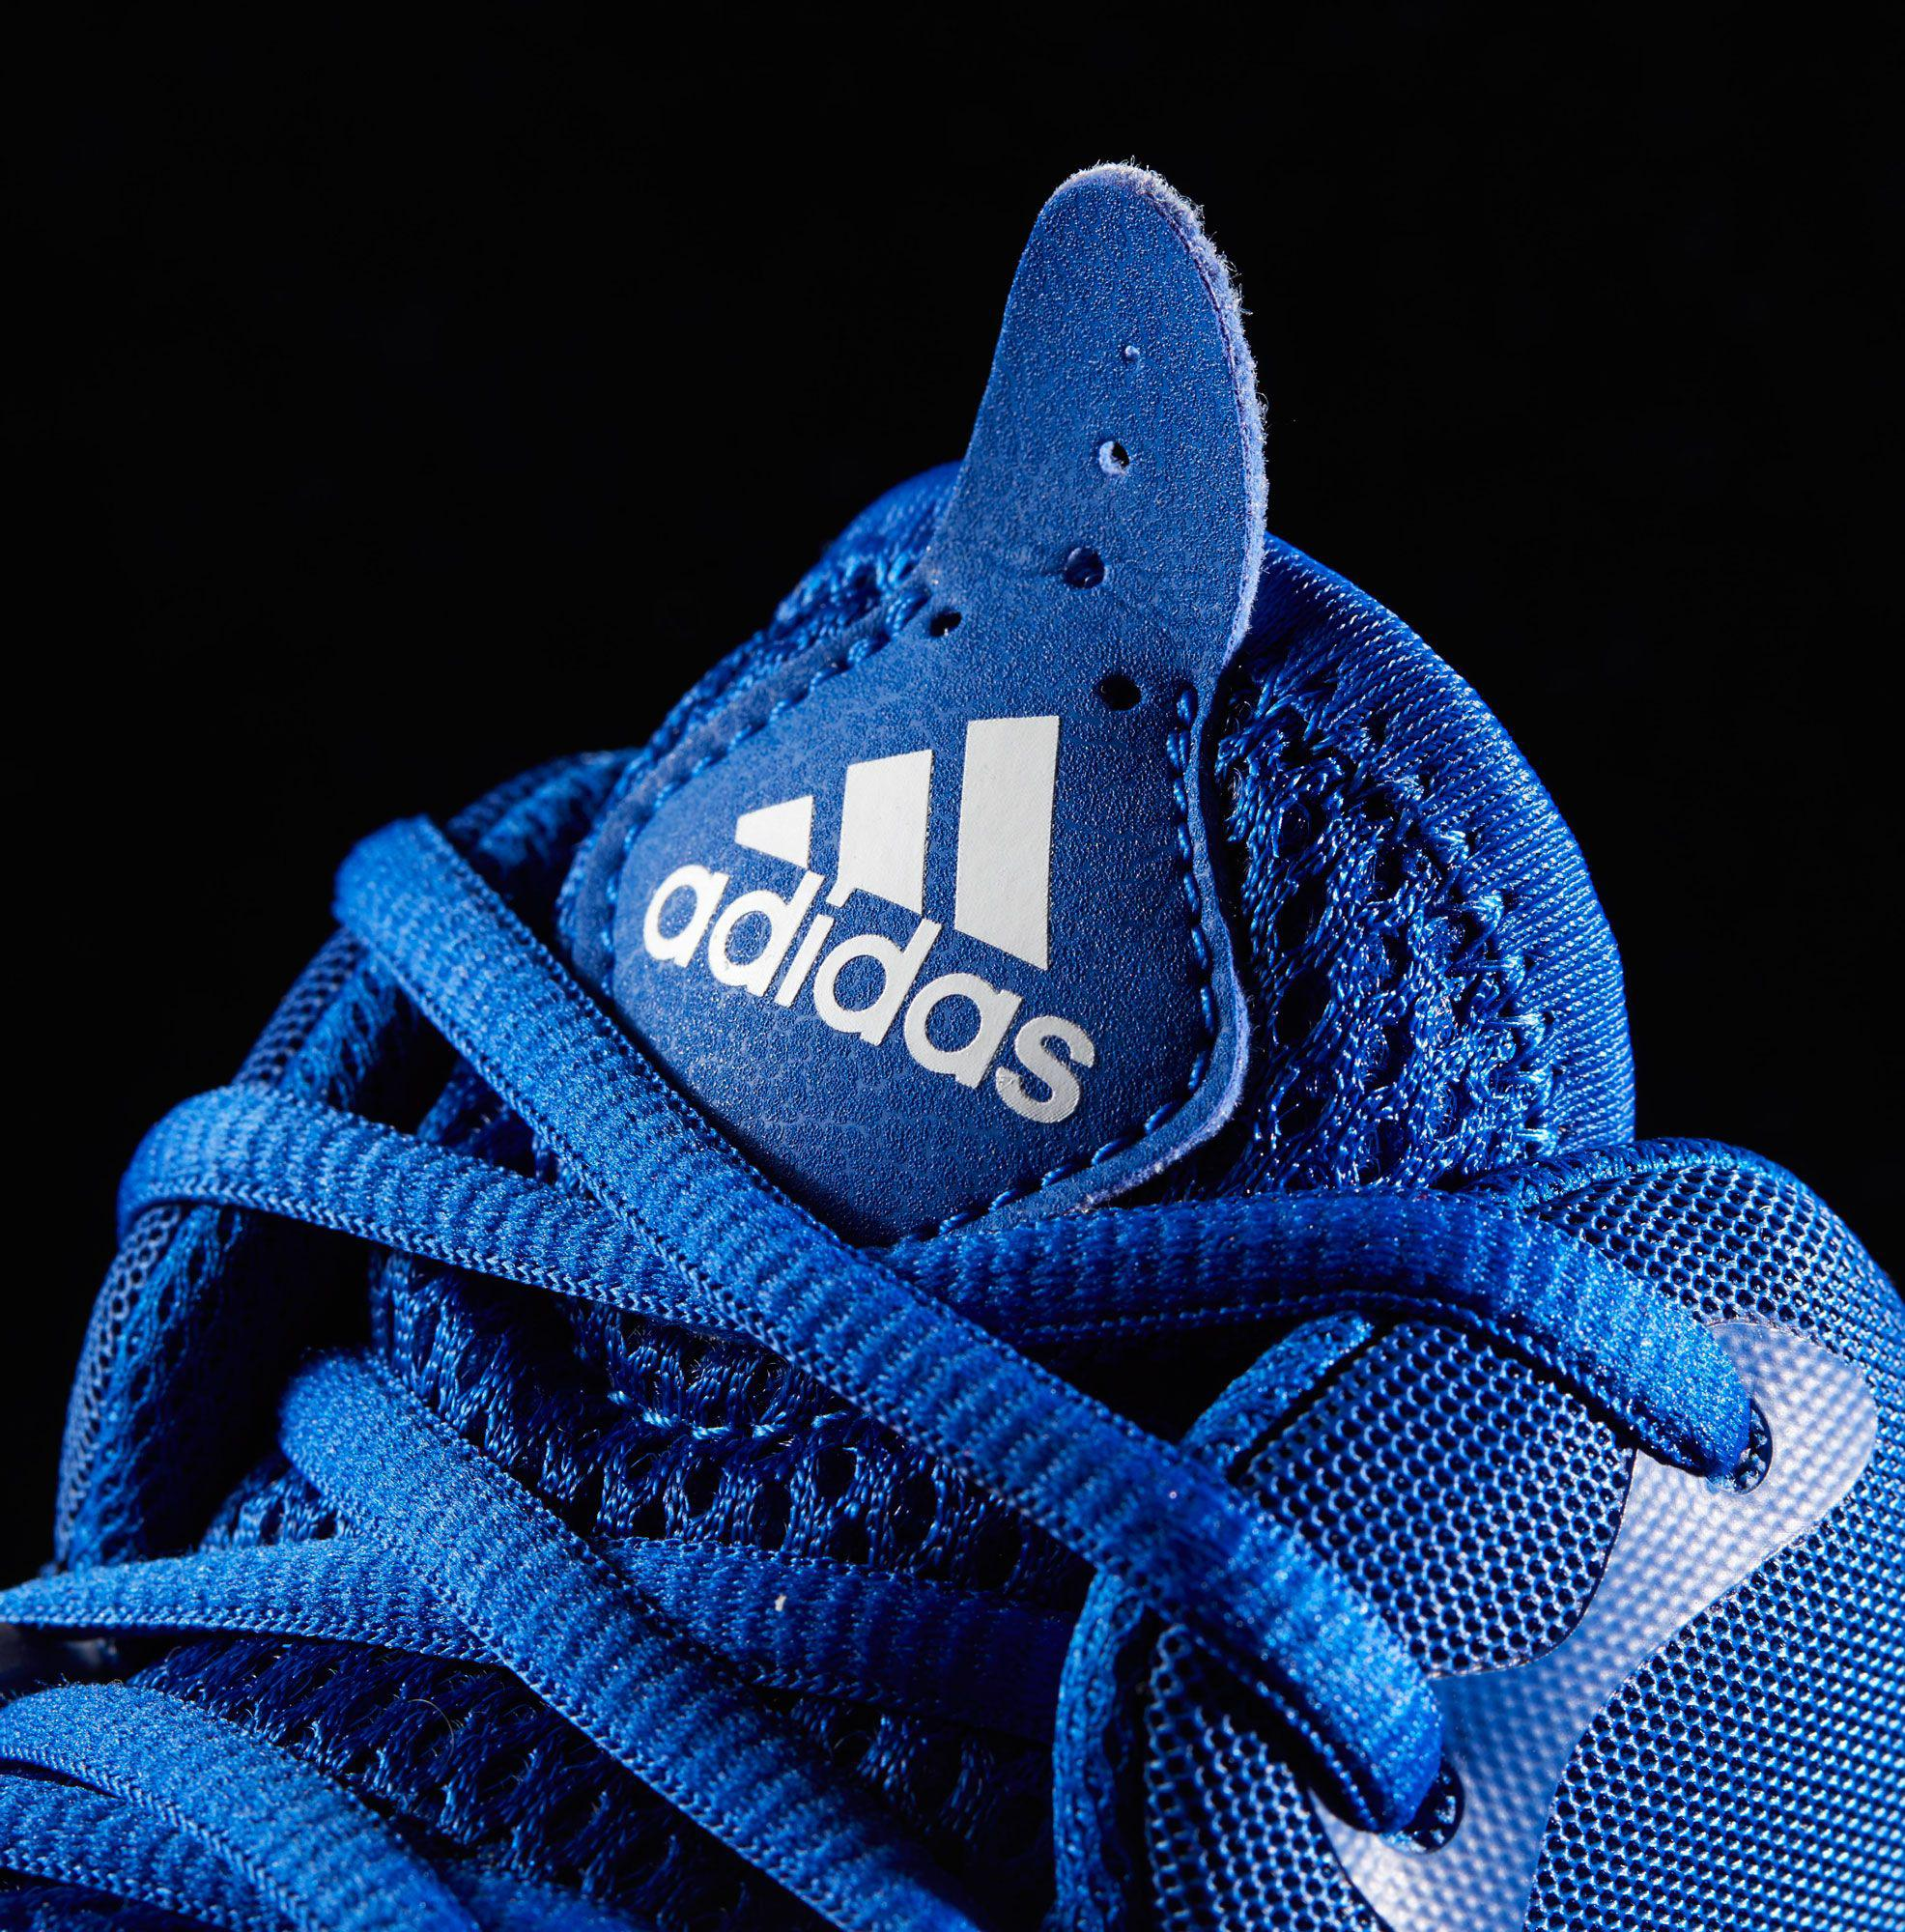 00b70c4b3a3c adidas Dual Threat 2017 Basketball Shoes in Blue for Men - Lyst